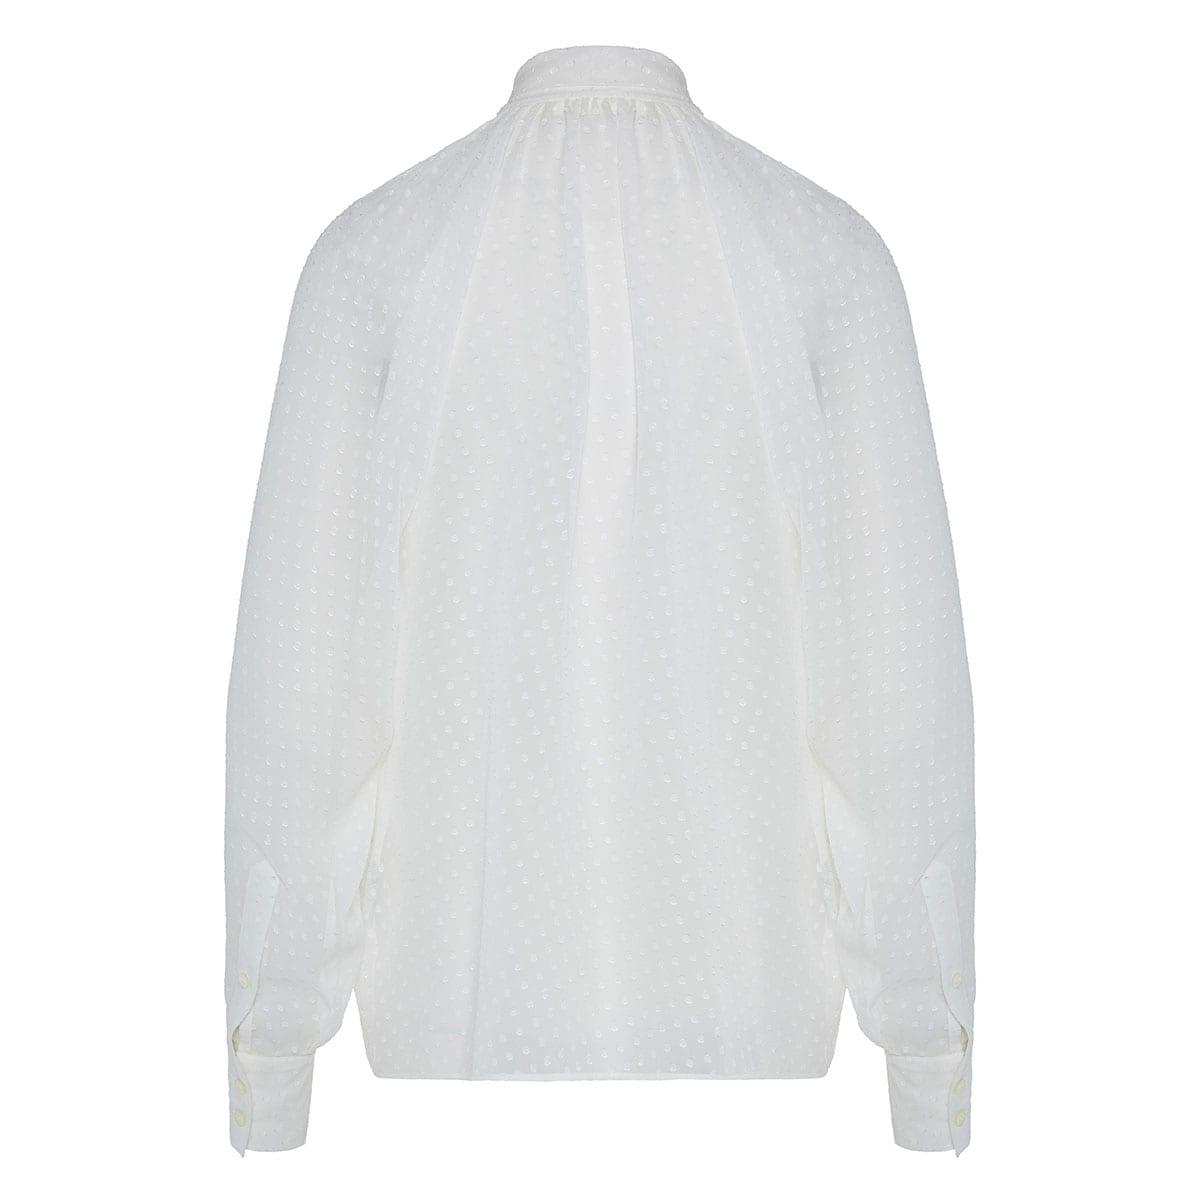 Bow-tie polka dot jacquard shirt